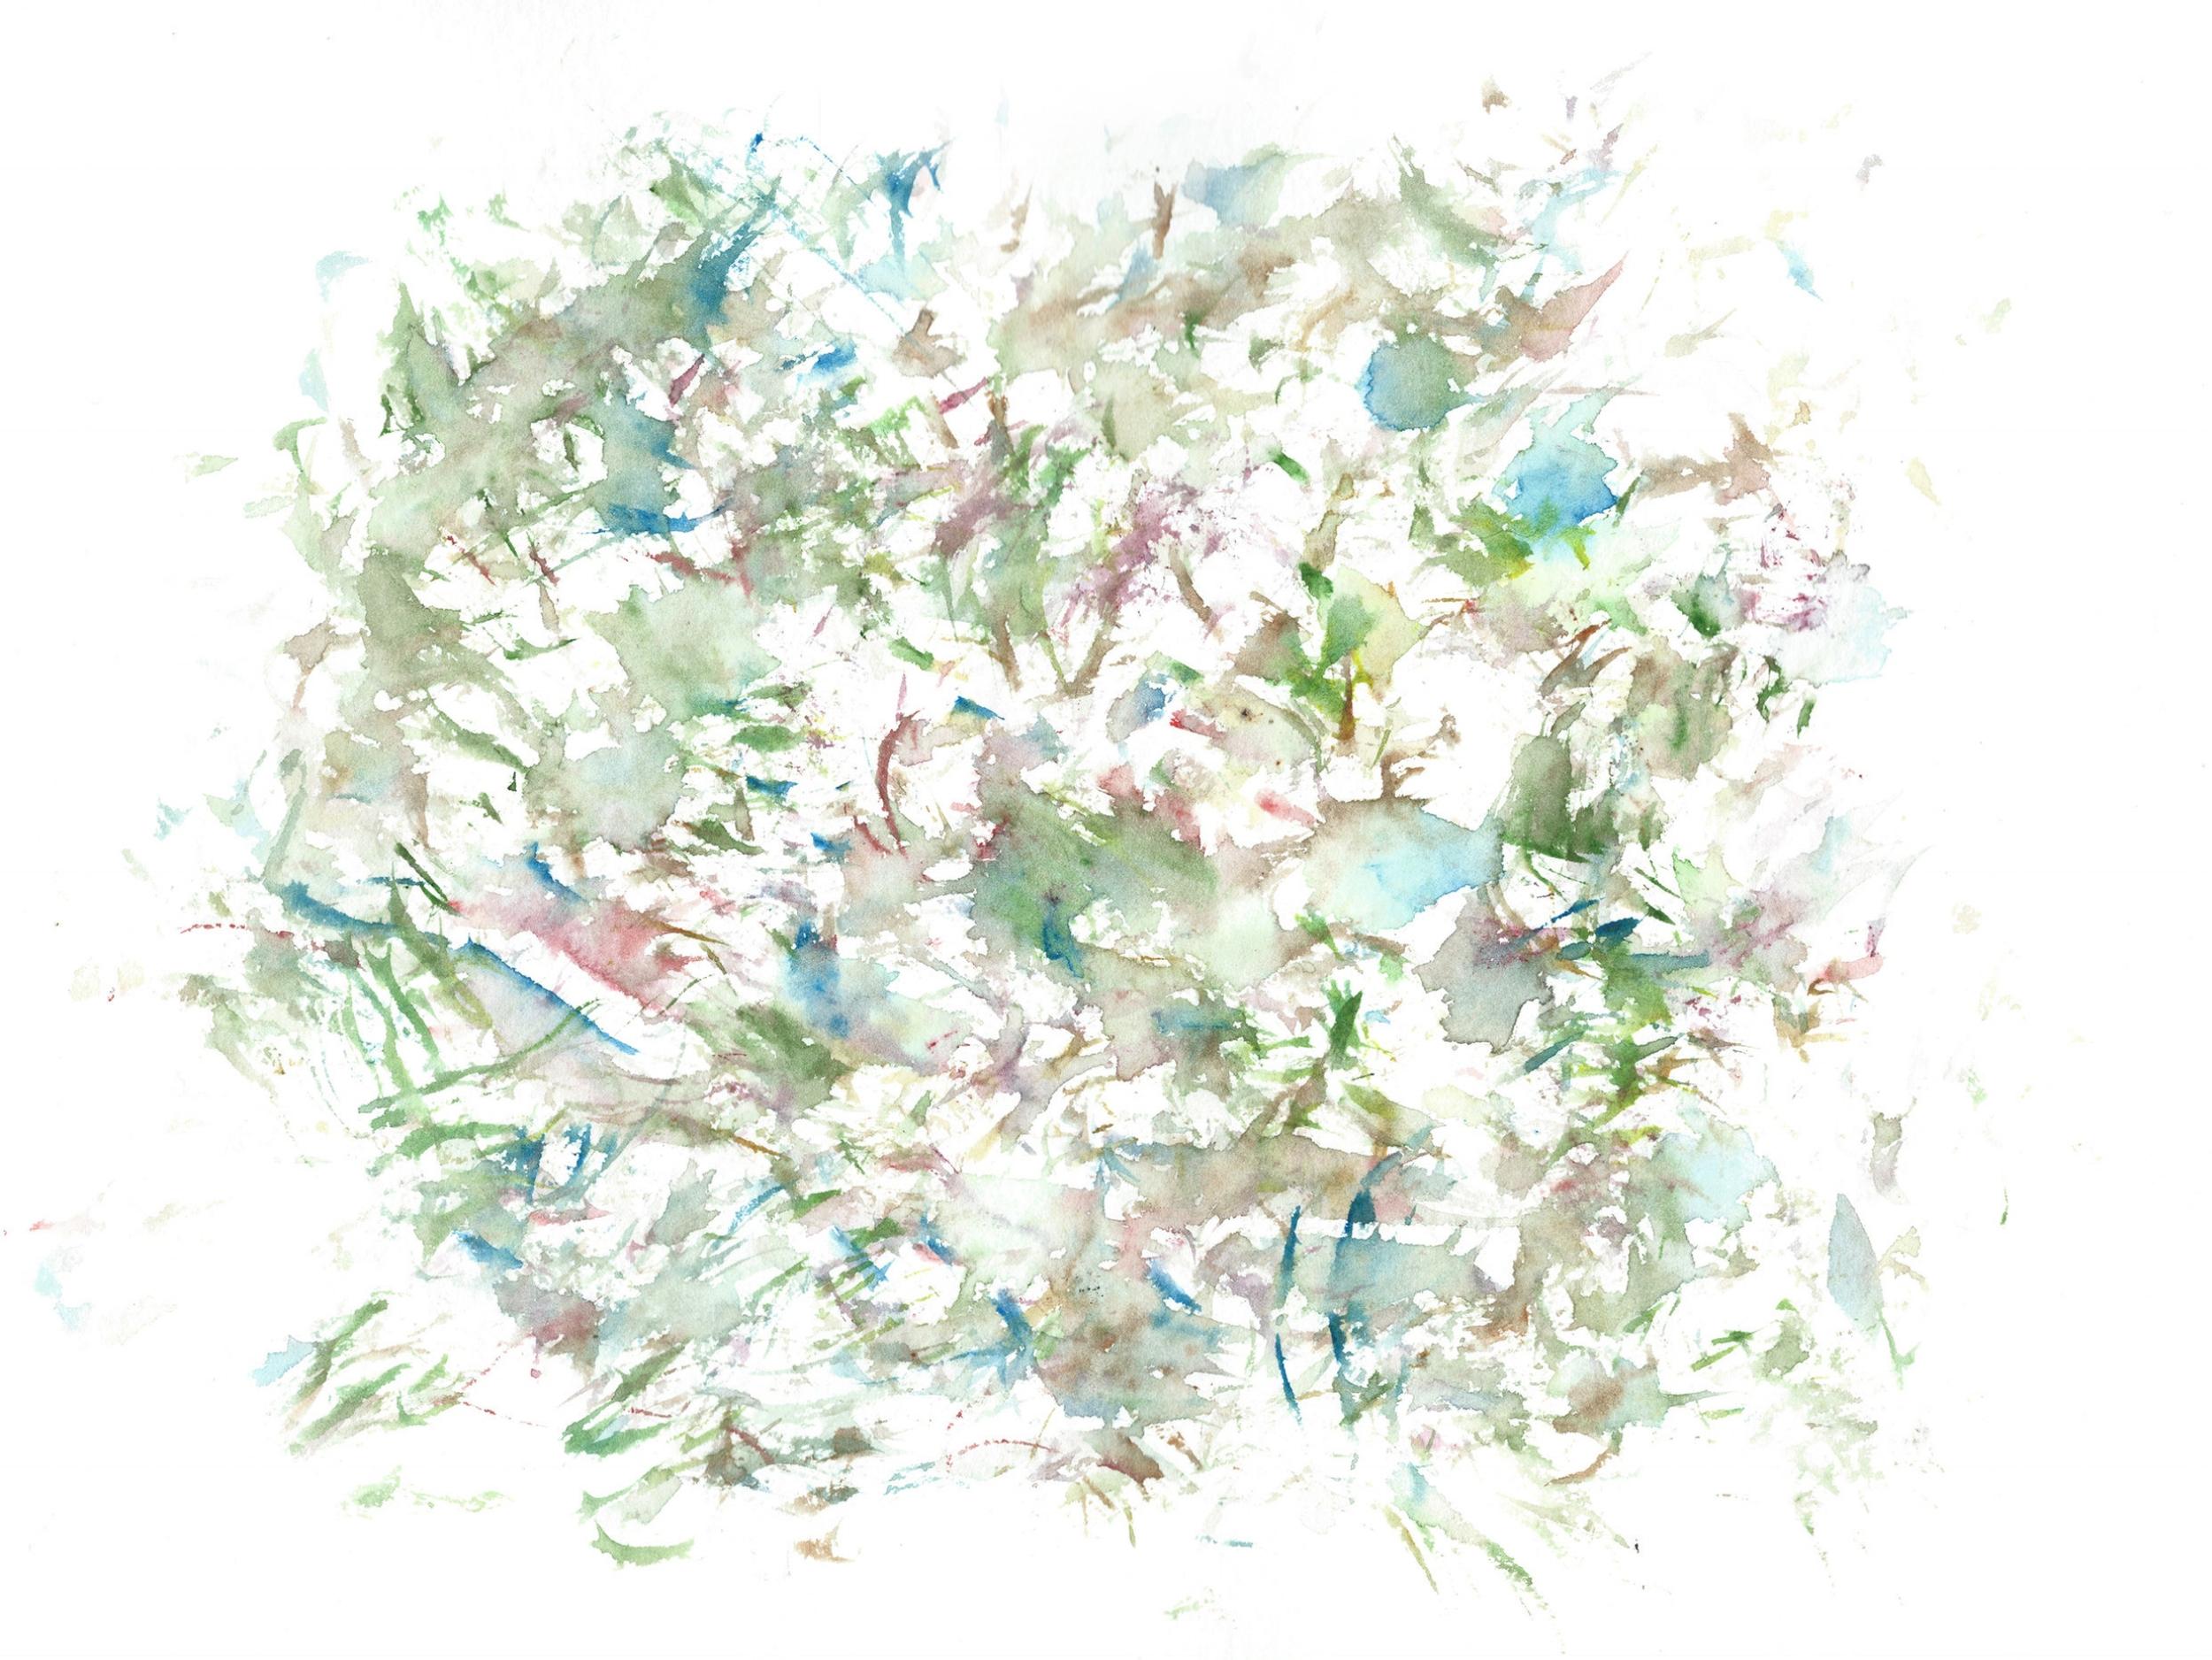 Stephen Thomas, Yoga, Yoga-Svarupa, watercolor 19